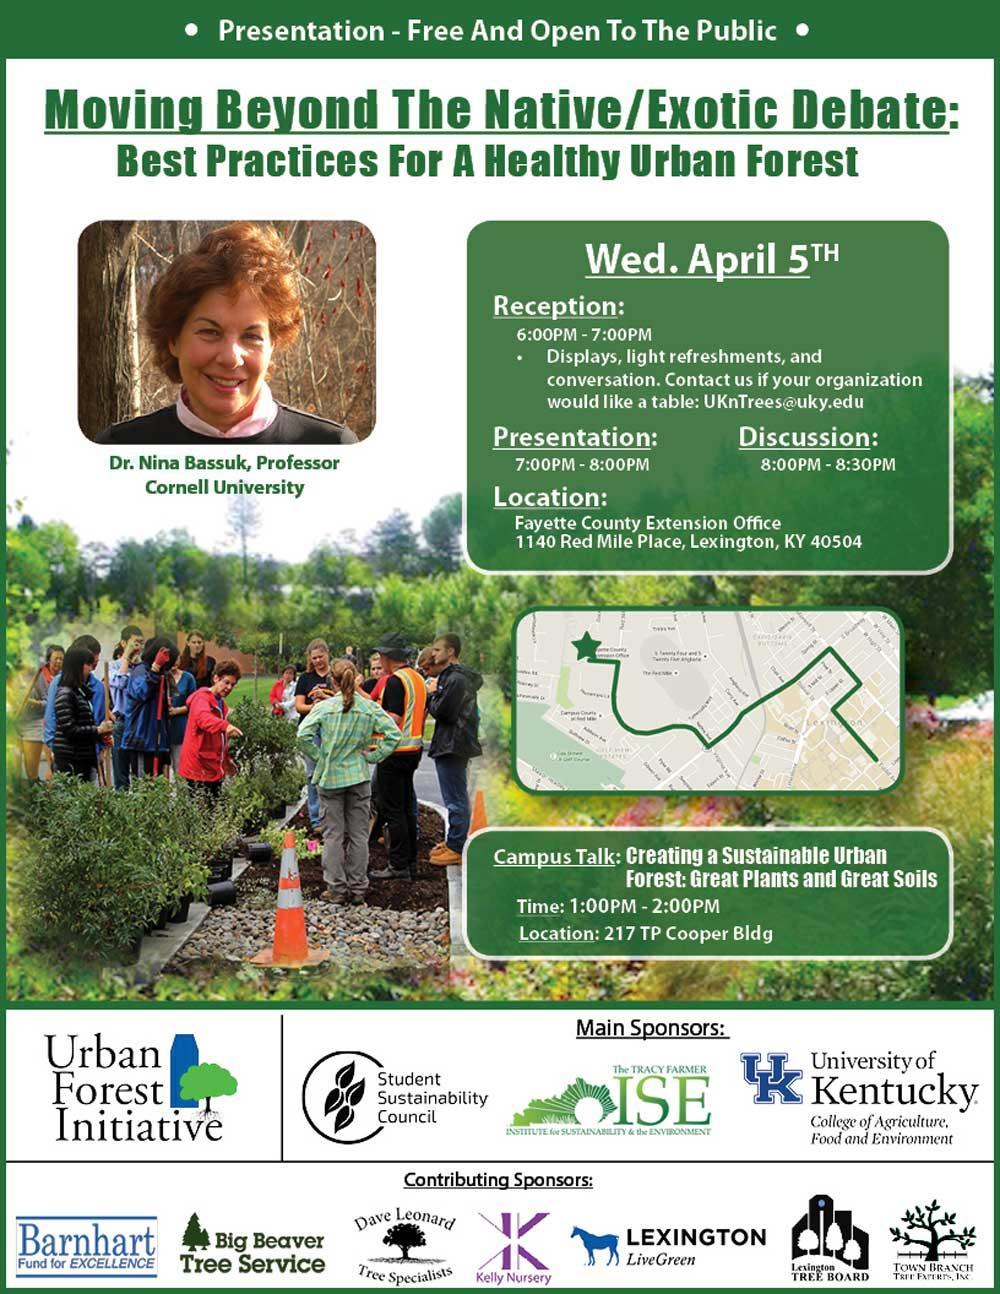 Dr. Nina Bassuk urban forestry seminar